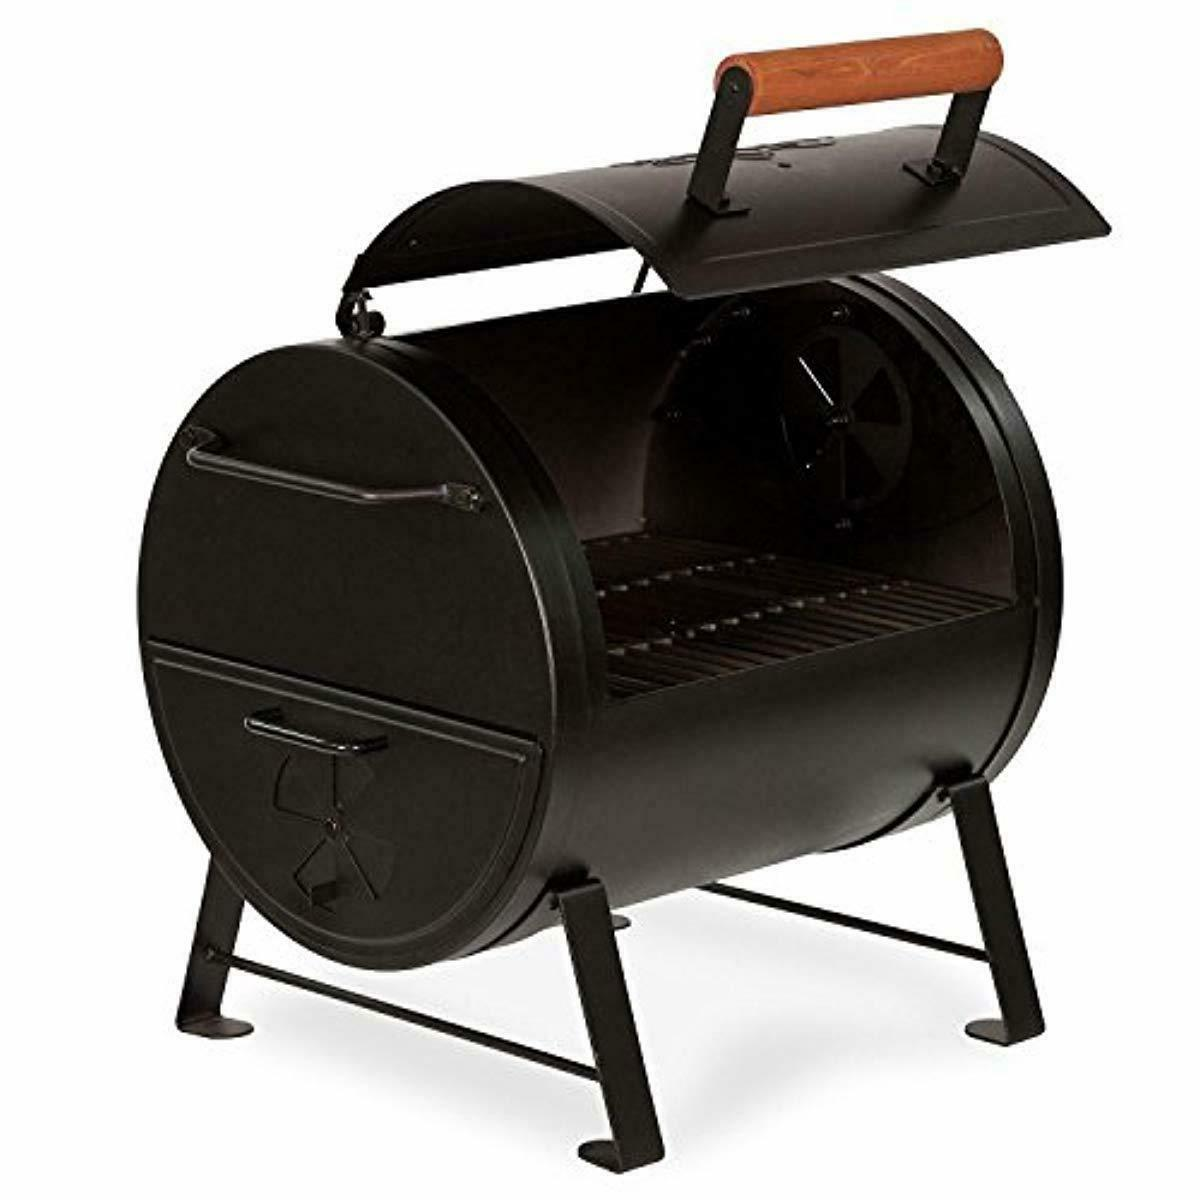 Char-Griller E22424 Charcoal Side Fire Box, Black